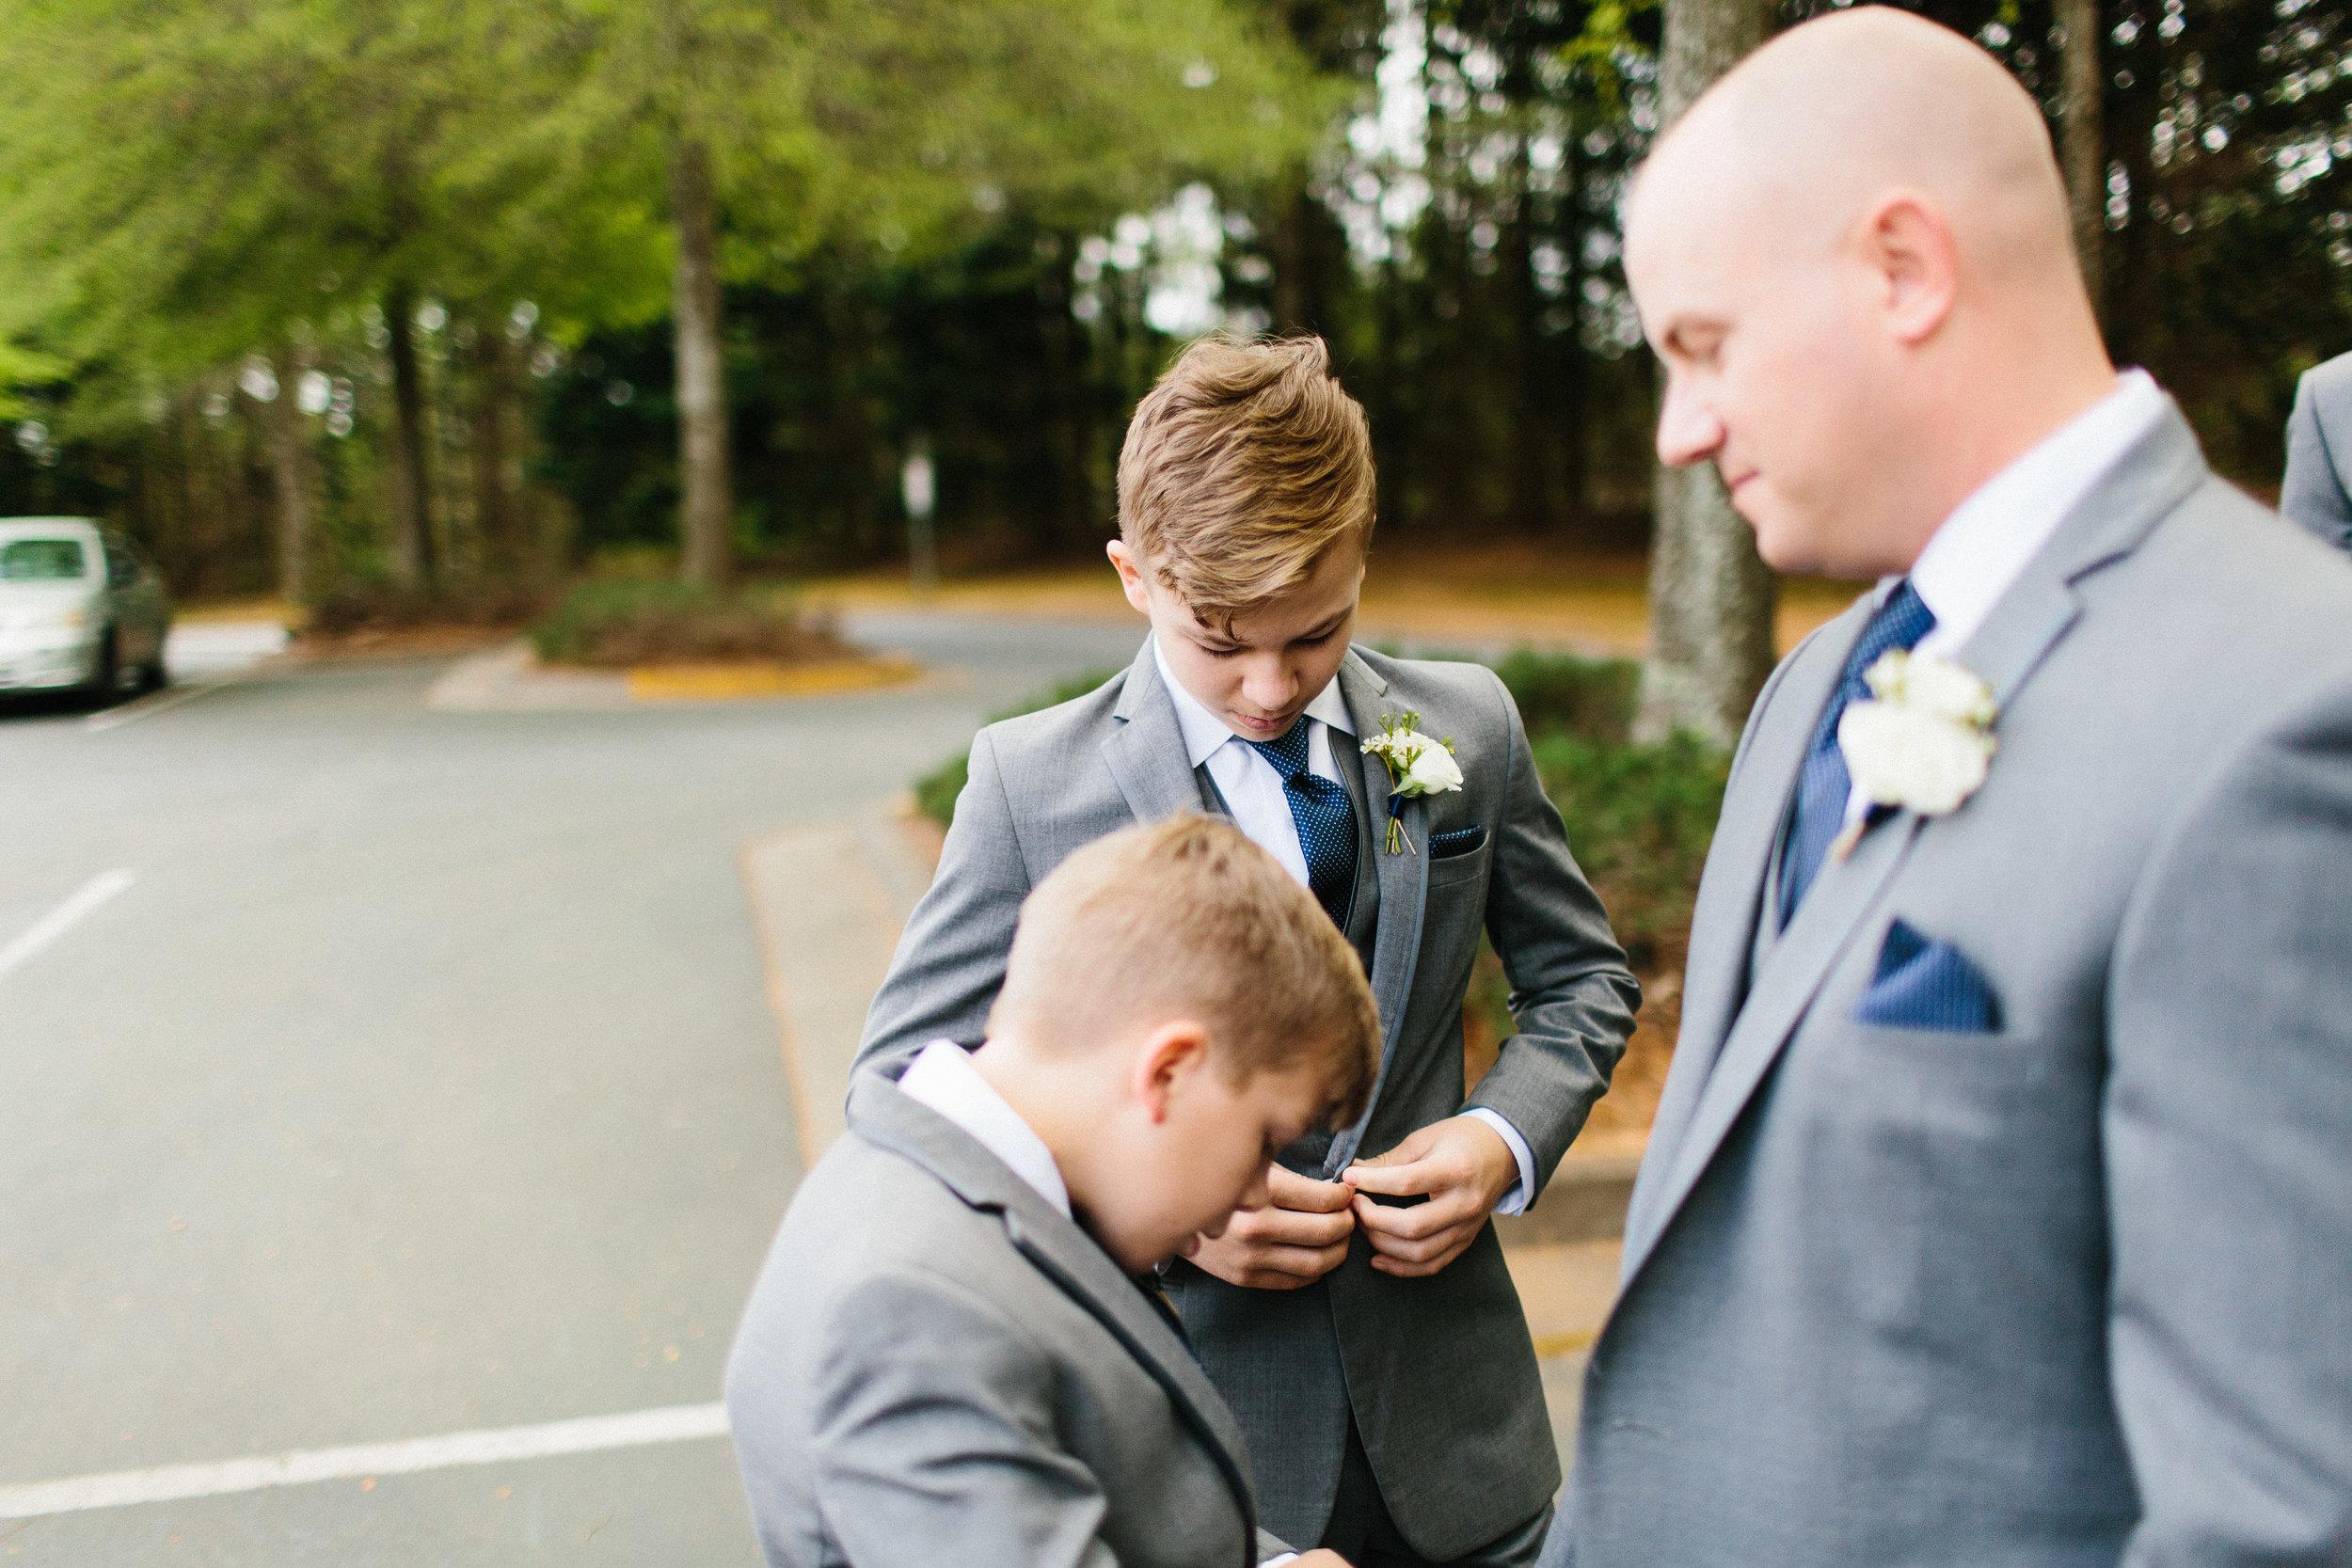 roswell_st_peter_chanel_catholic_avalon_hotel_alpharetta_wedding-1298.jpg